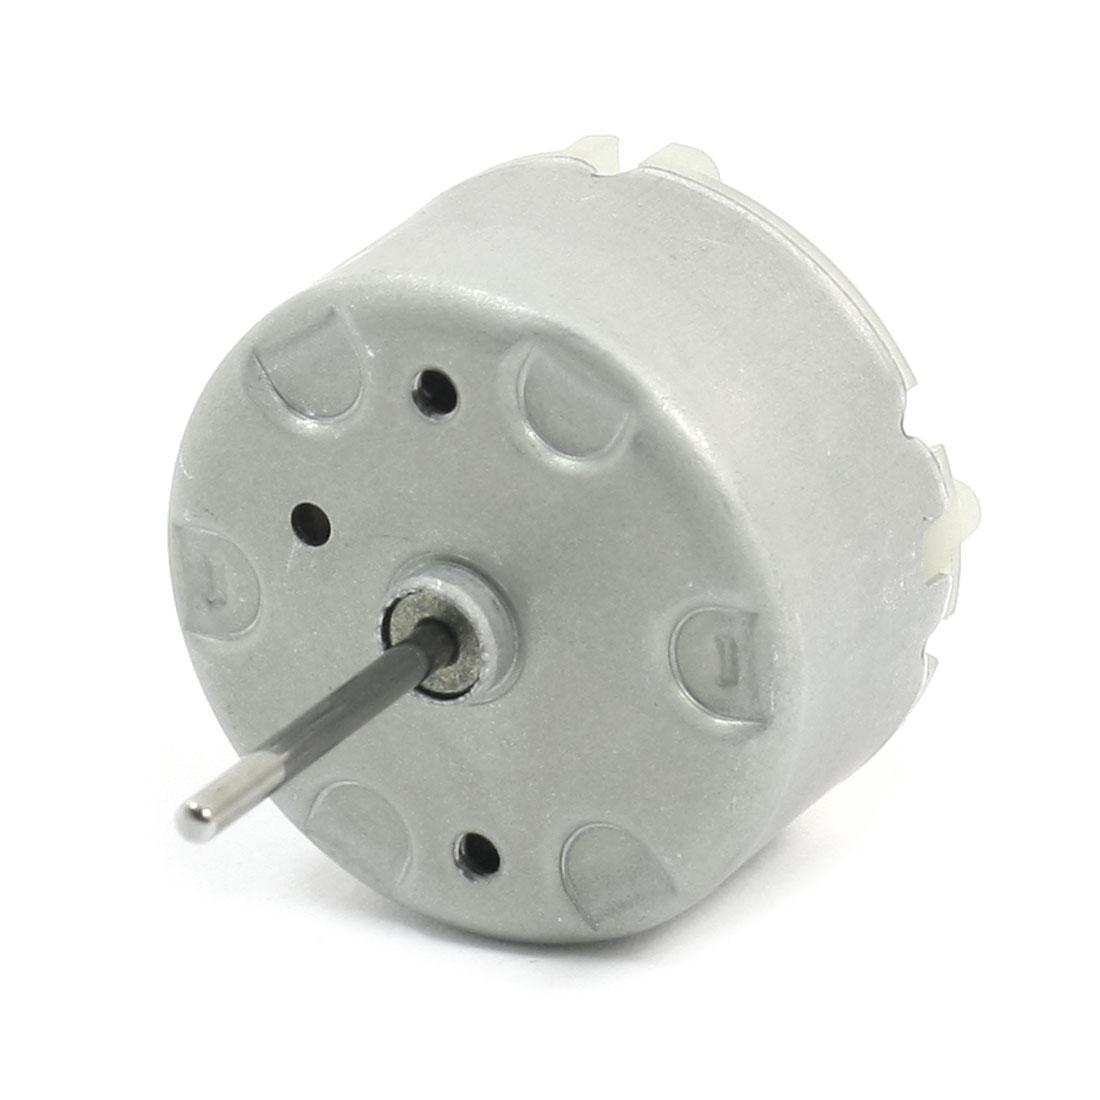 RF-500TB-12560 DC 6V 2700RPM 0.588N.M Torque 0.028A Brushed Motor